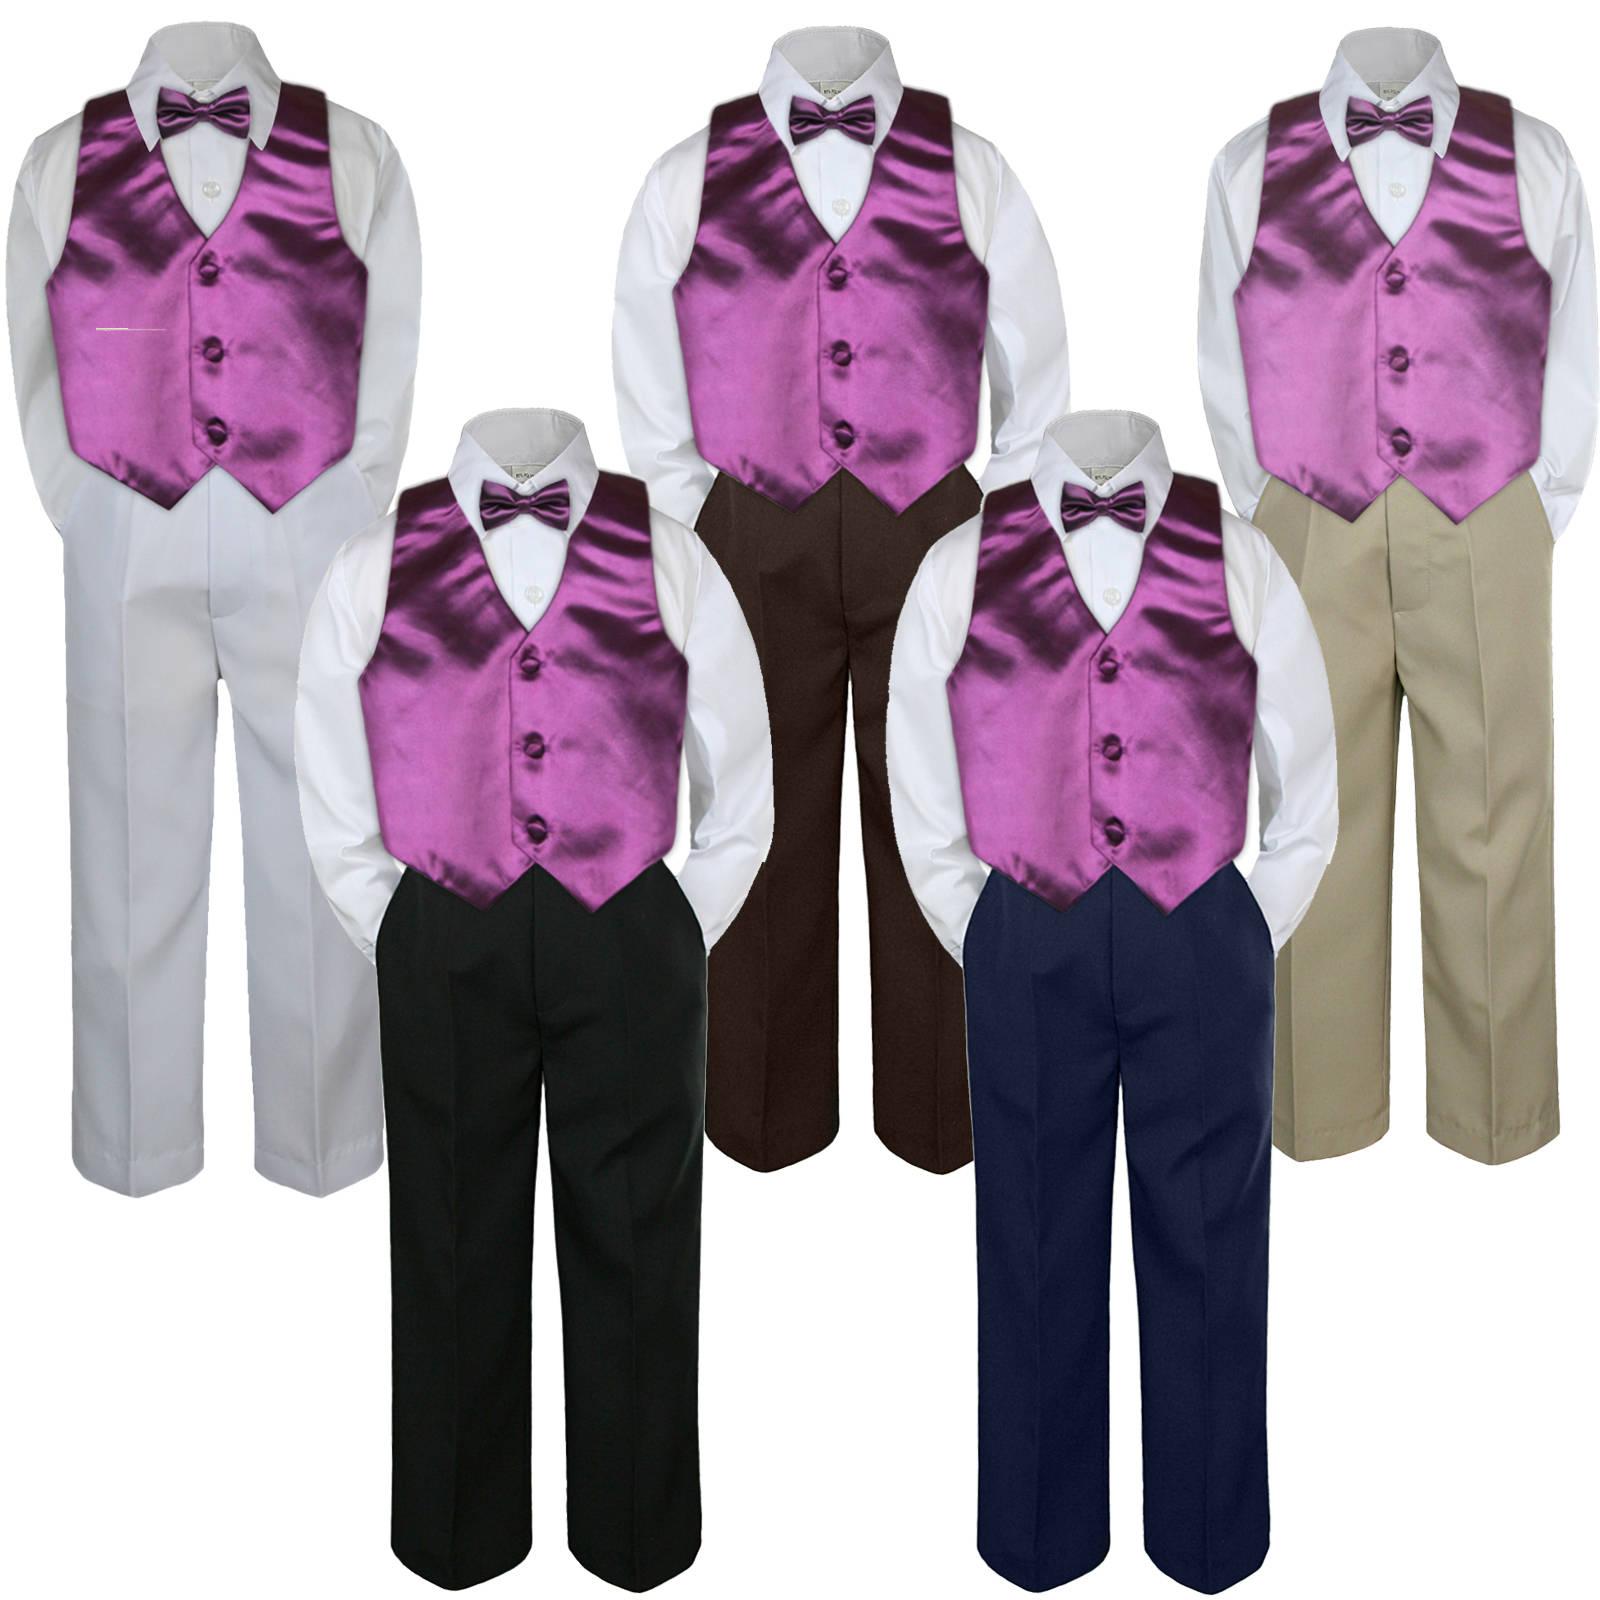 4pc  Baby Toddlers Boys NAVY PANTS 23 colors Selection Formal Vest Set Suit  C1+507